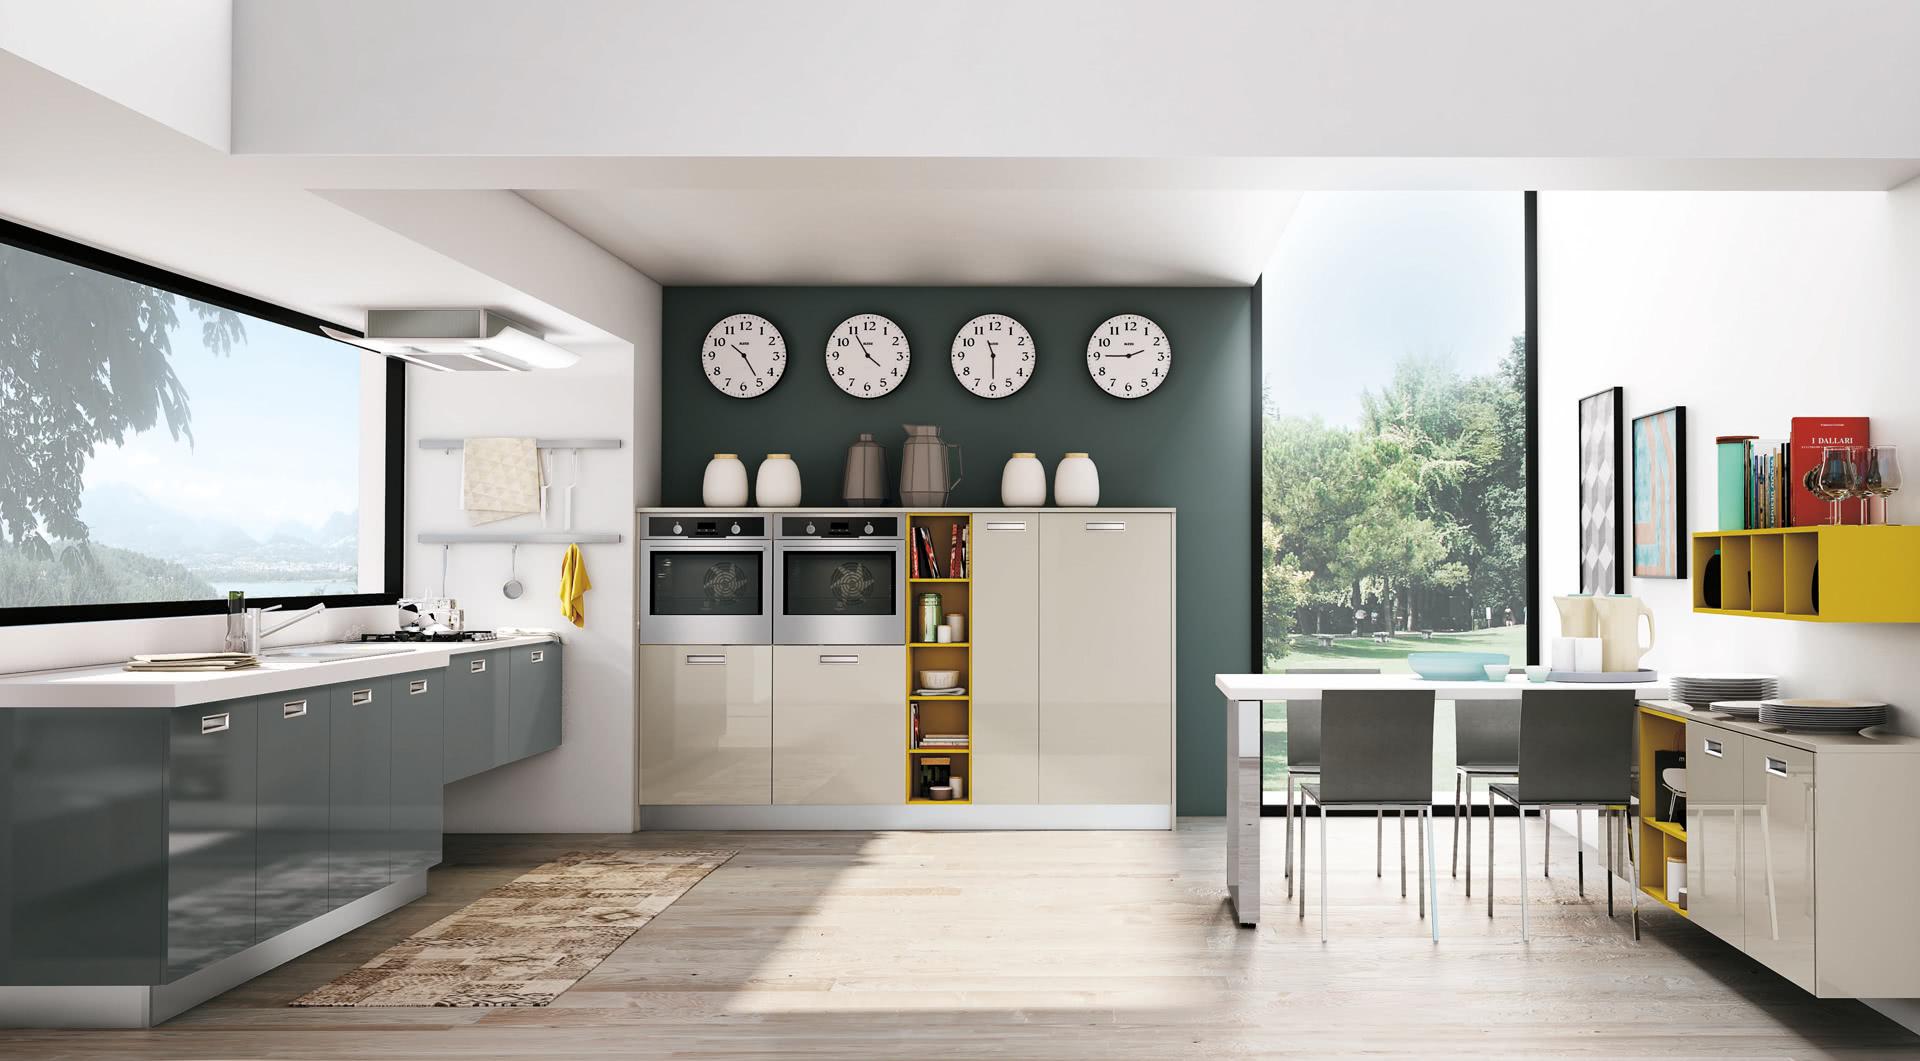 Cucina moderna lube zoe creo kitchens for Cucina zoe